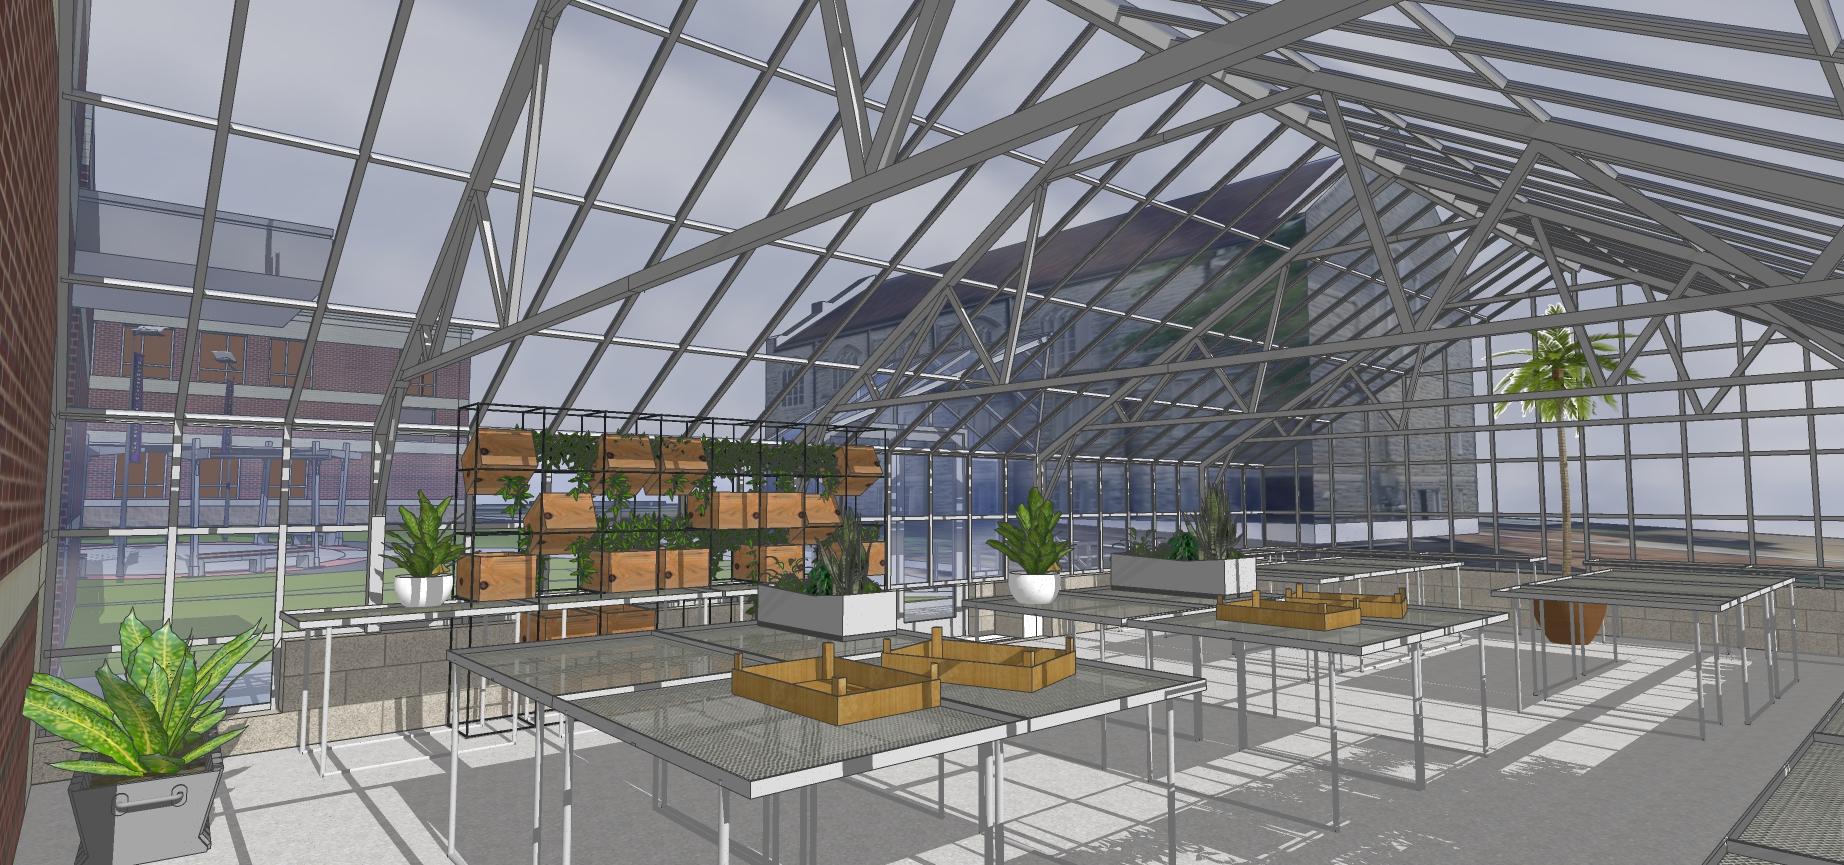 Ozark Science Greenhouse 2541 -Interior